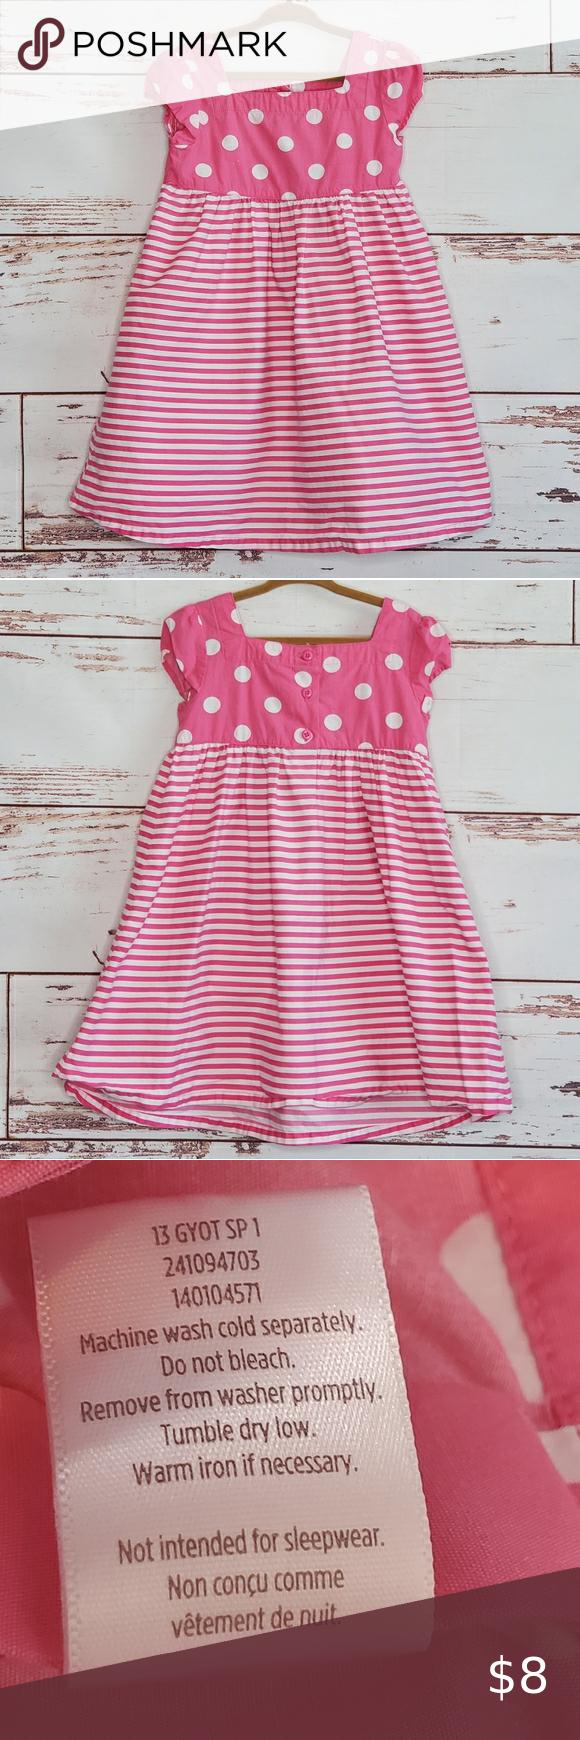 Gymboree Cotton Dress Pink Striped 4t Pink Dress Cotton Dresses Cotton Sundress [ 1740 x 580 Pixel ]